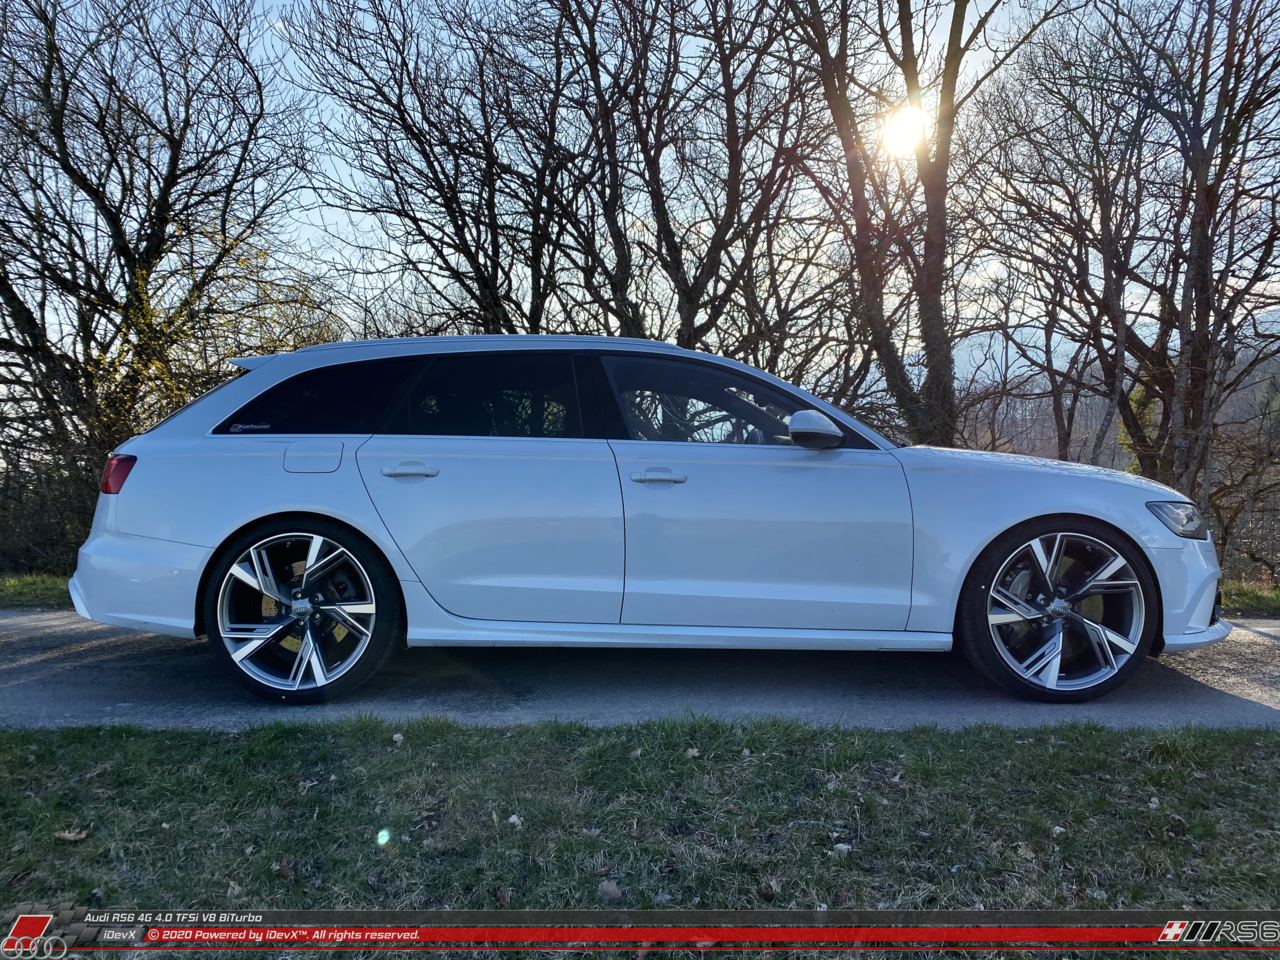 18.03.2020_Audi-RS6_iDevX_007.png